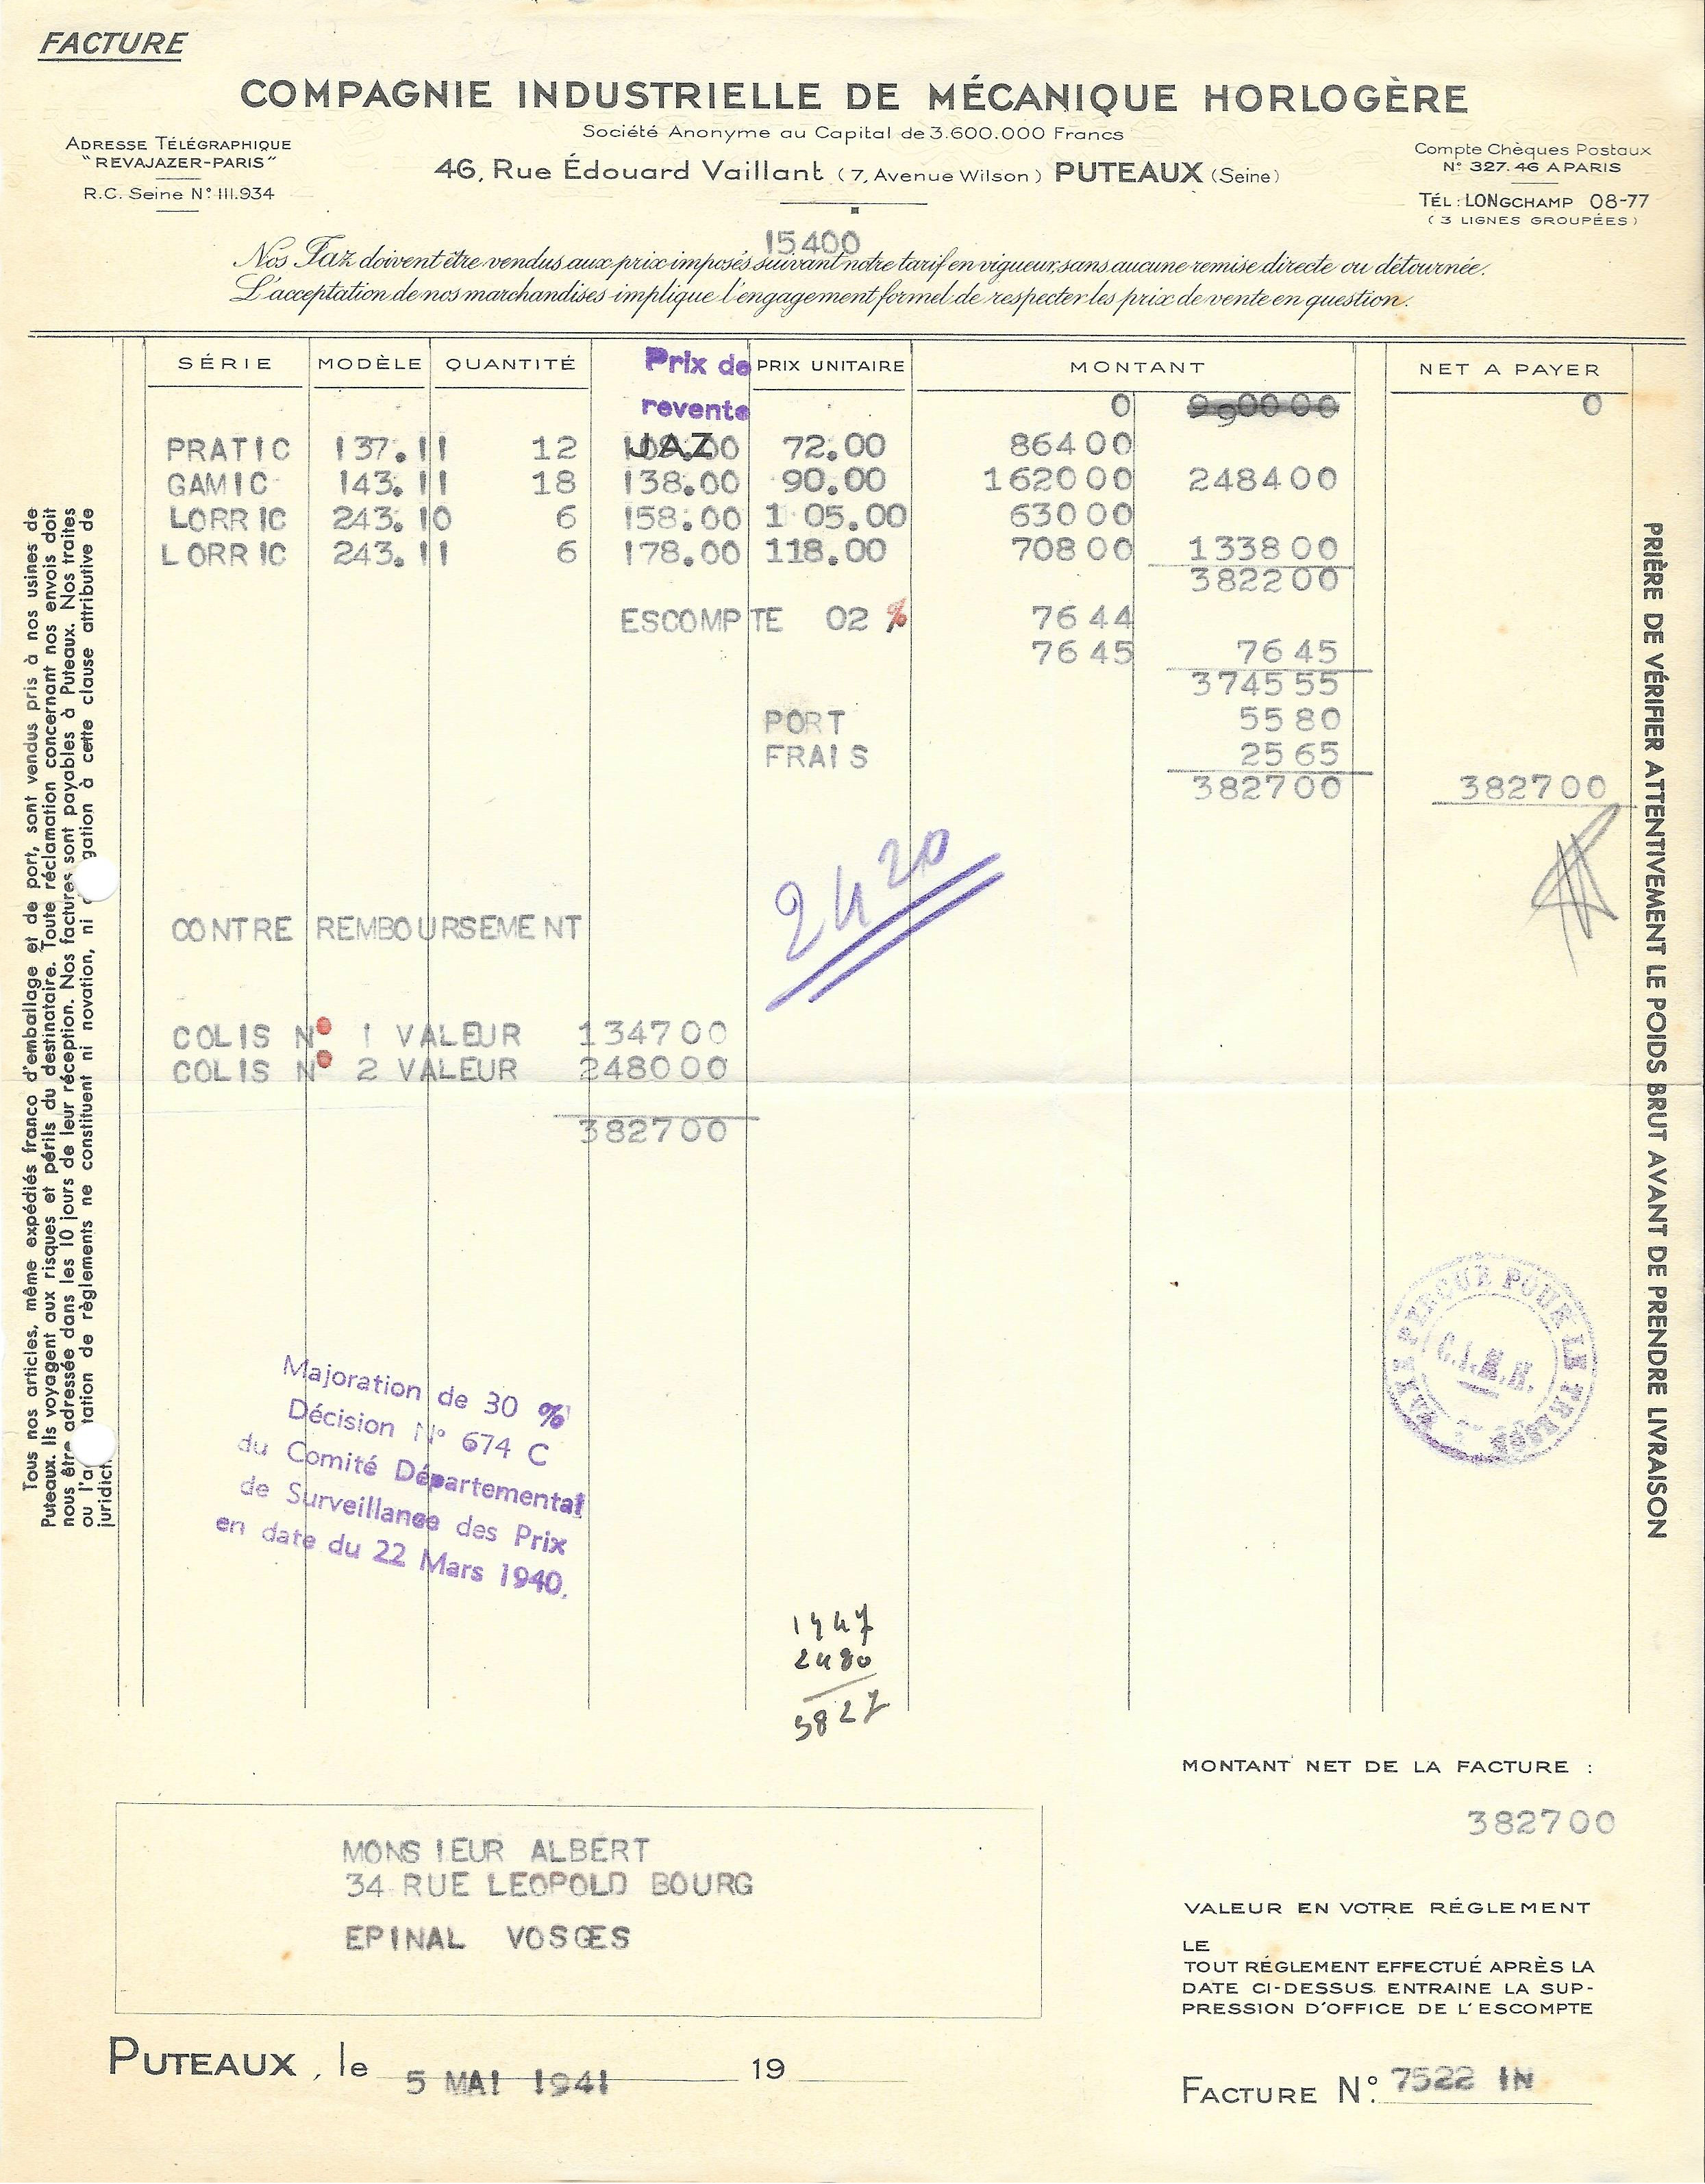 Jaz Facture 5 Mai 1941 PRATIC et LORRIC